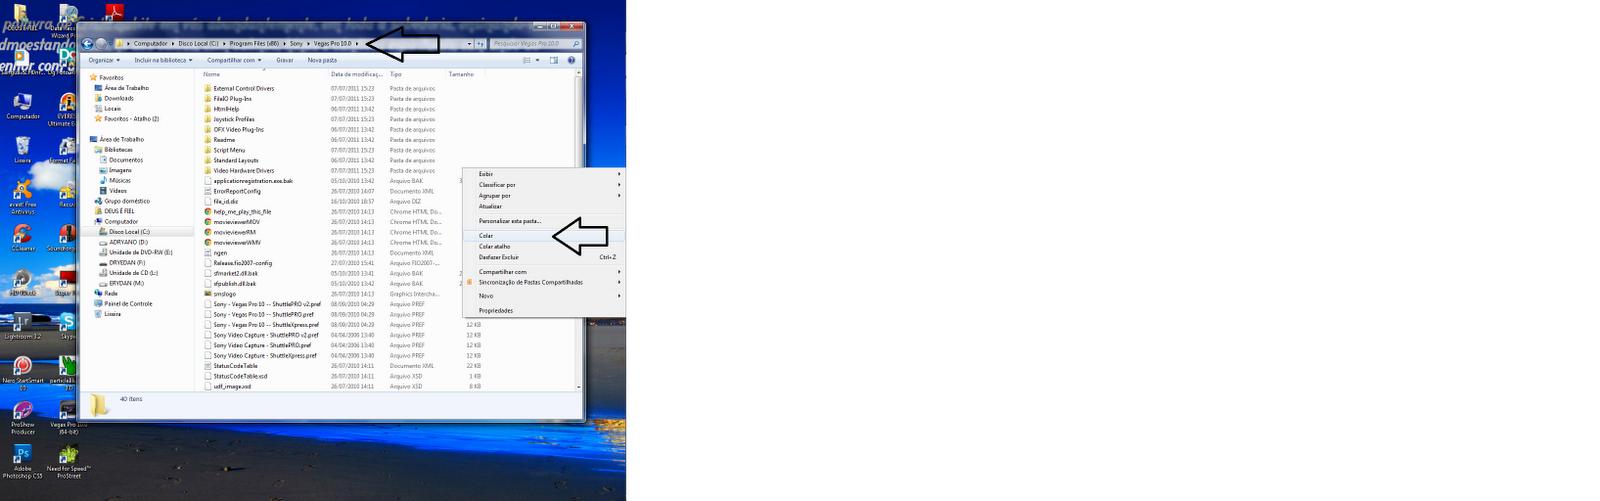 matlab 2013b activation key free